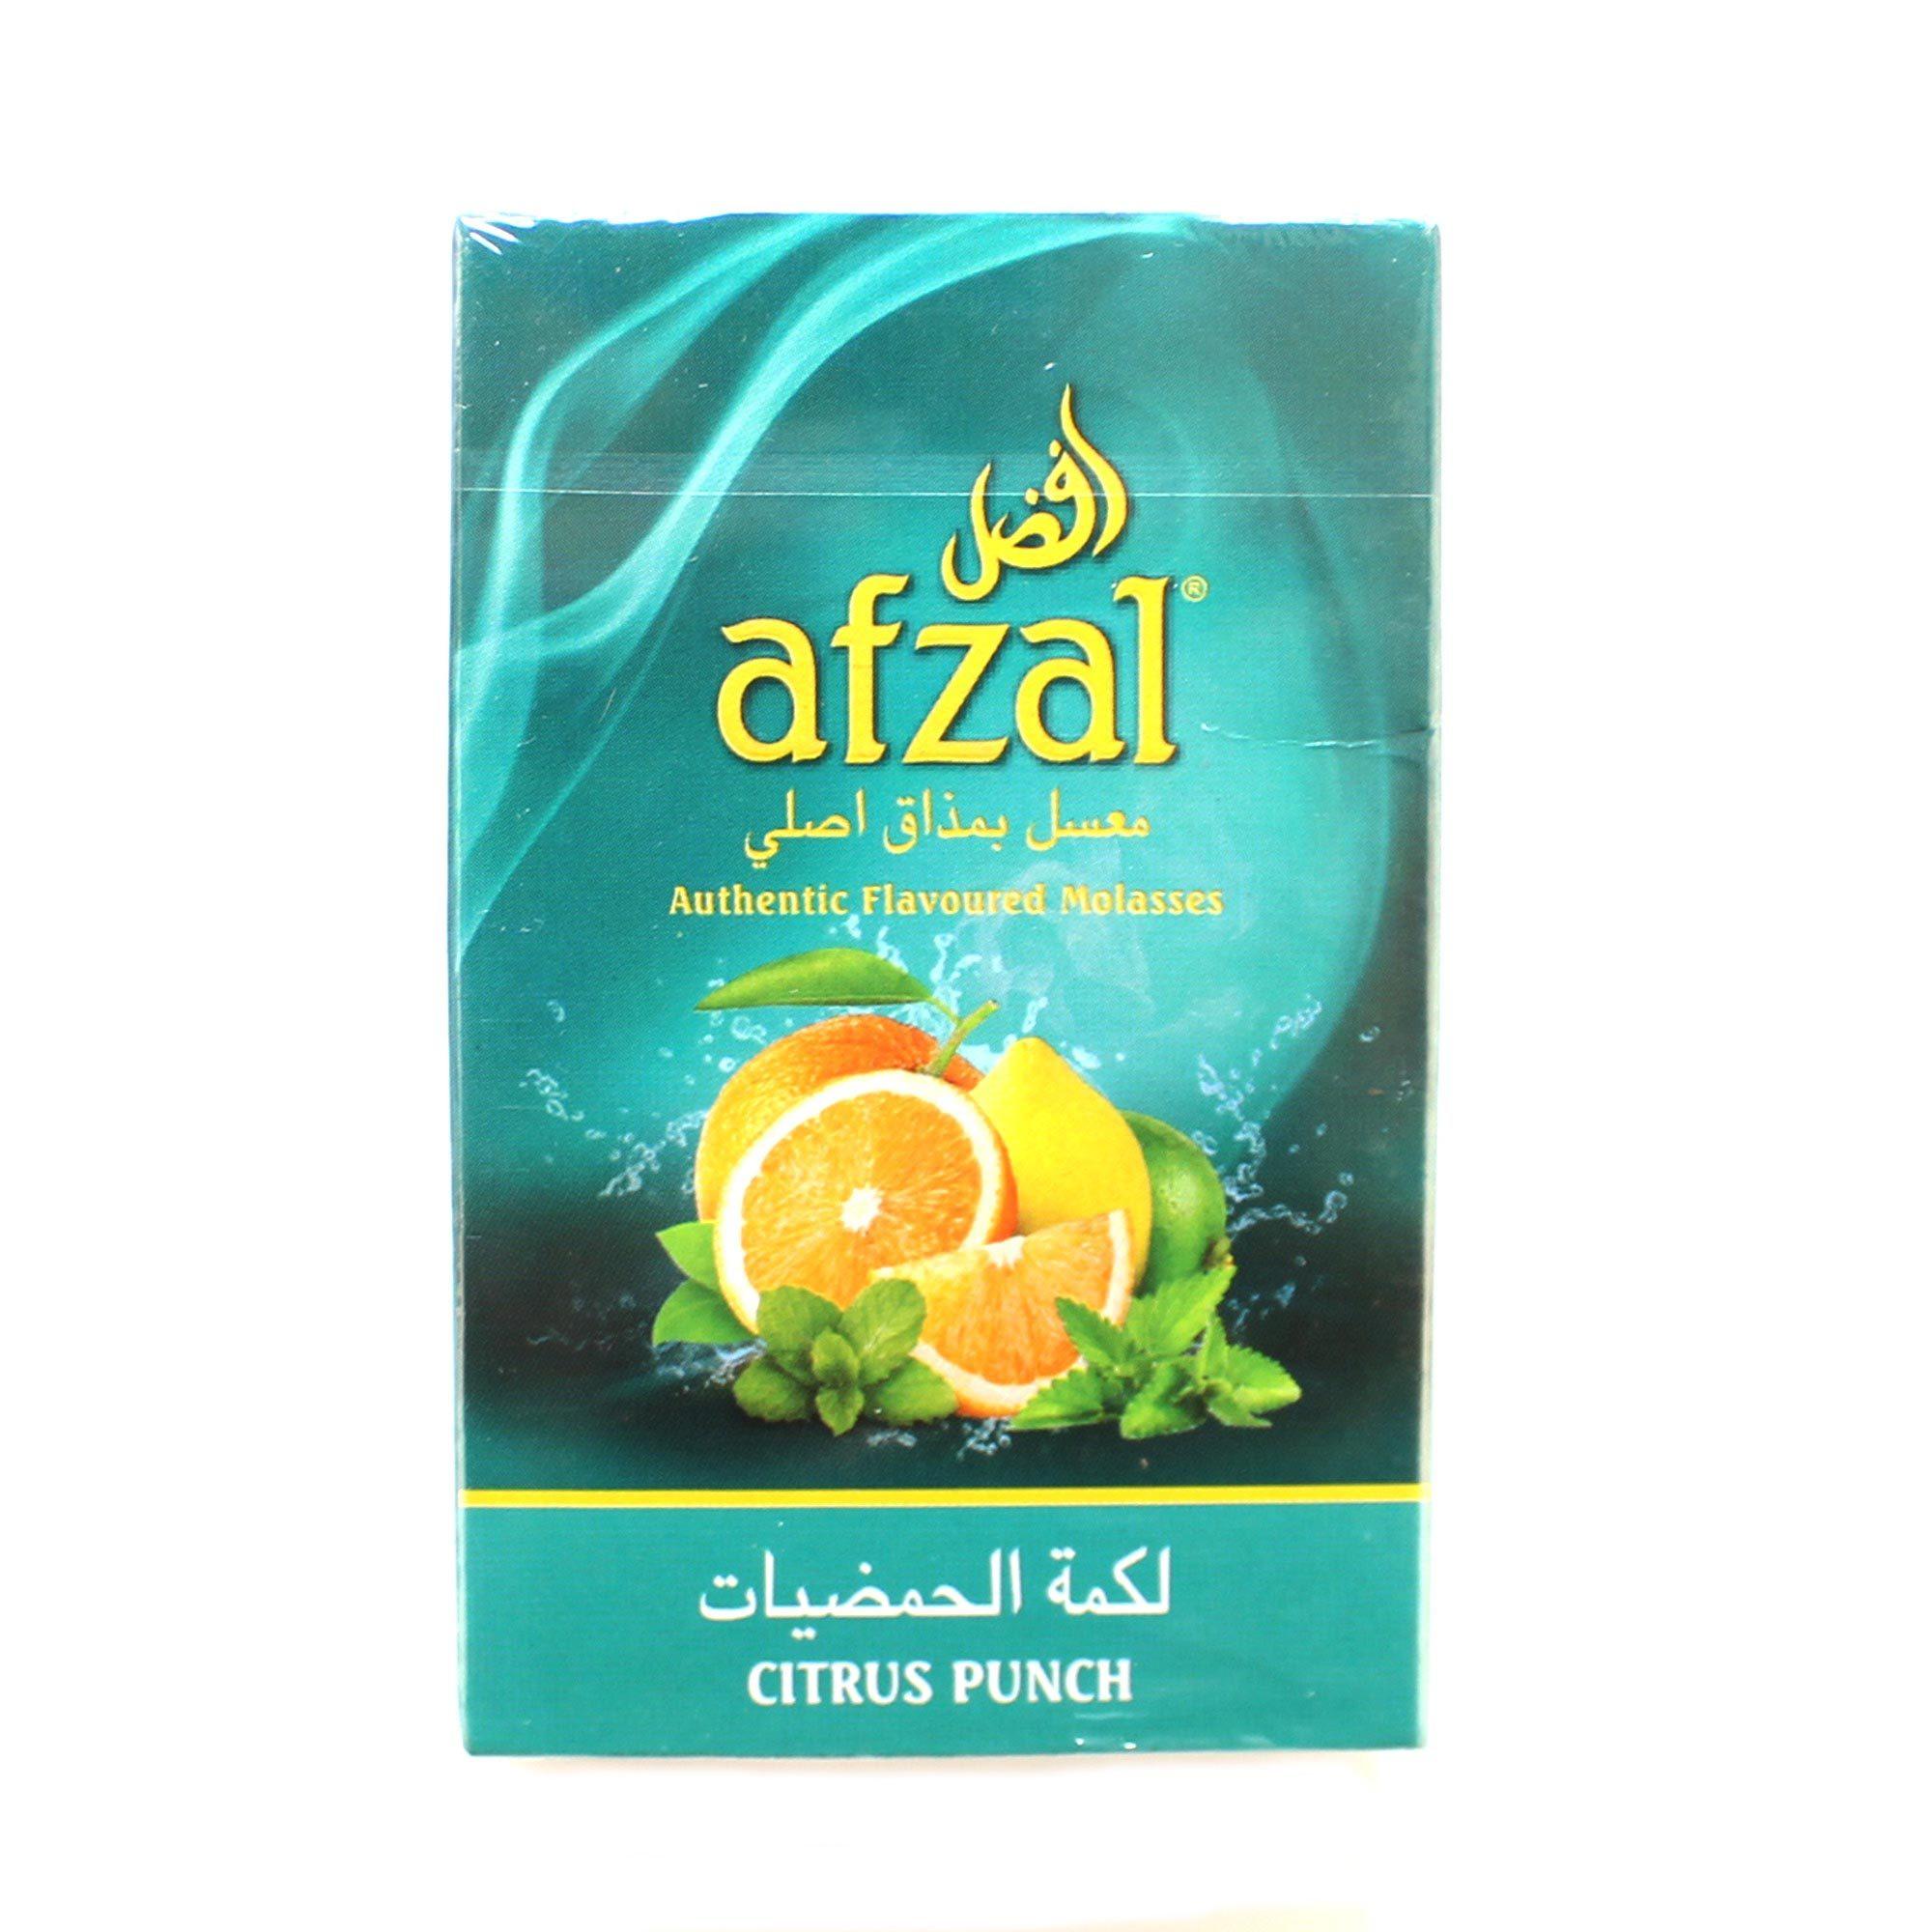 Табак для кальяна Afzal Citrus Punch 50 гр.